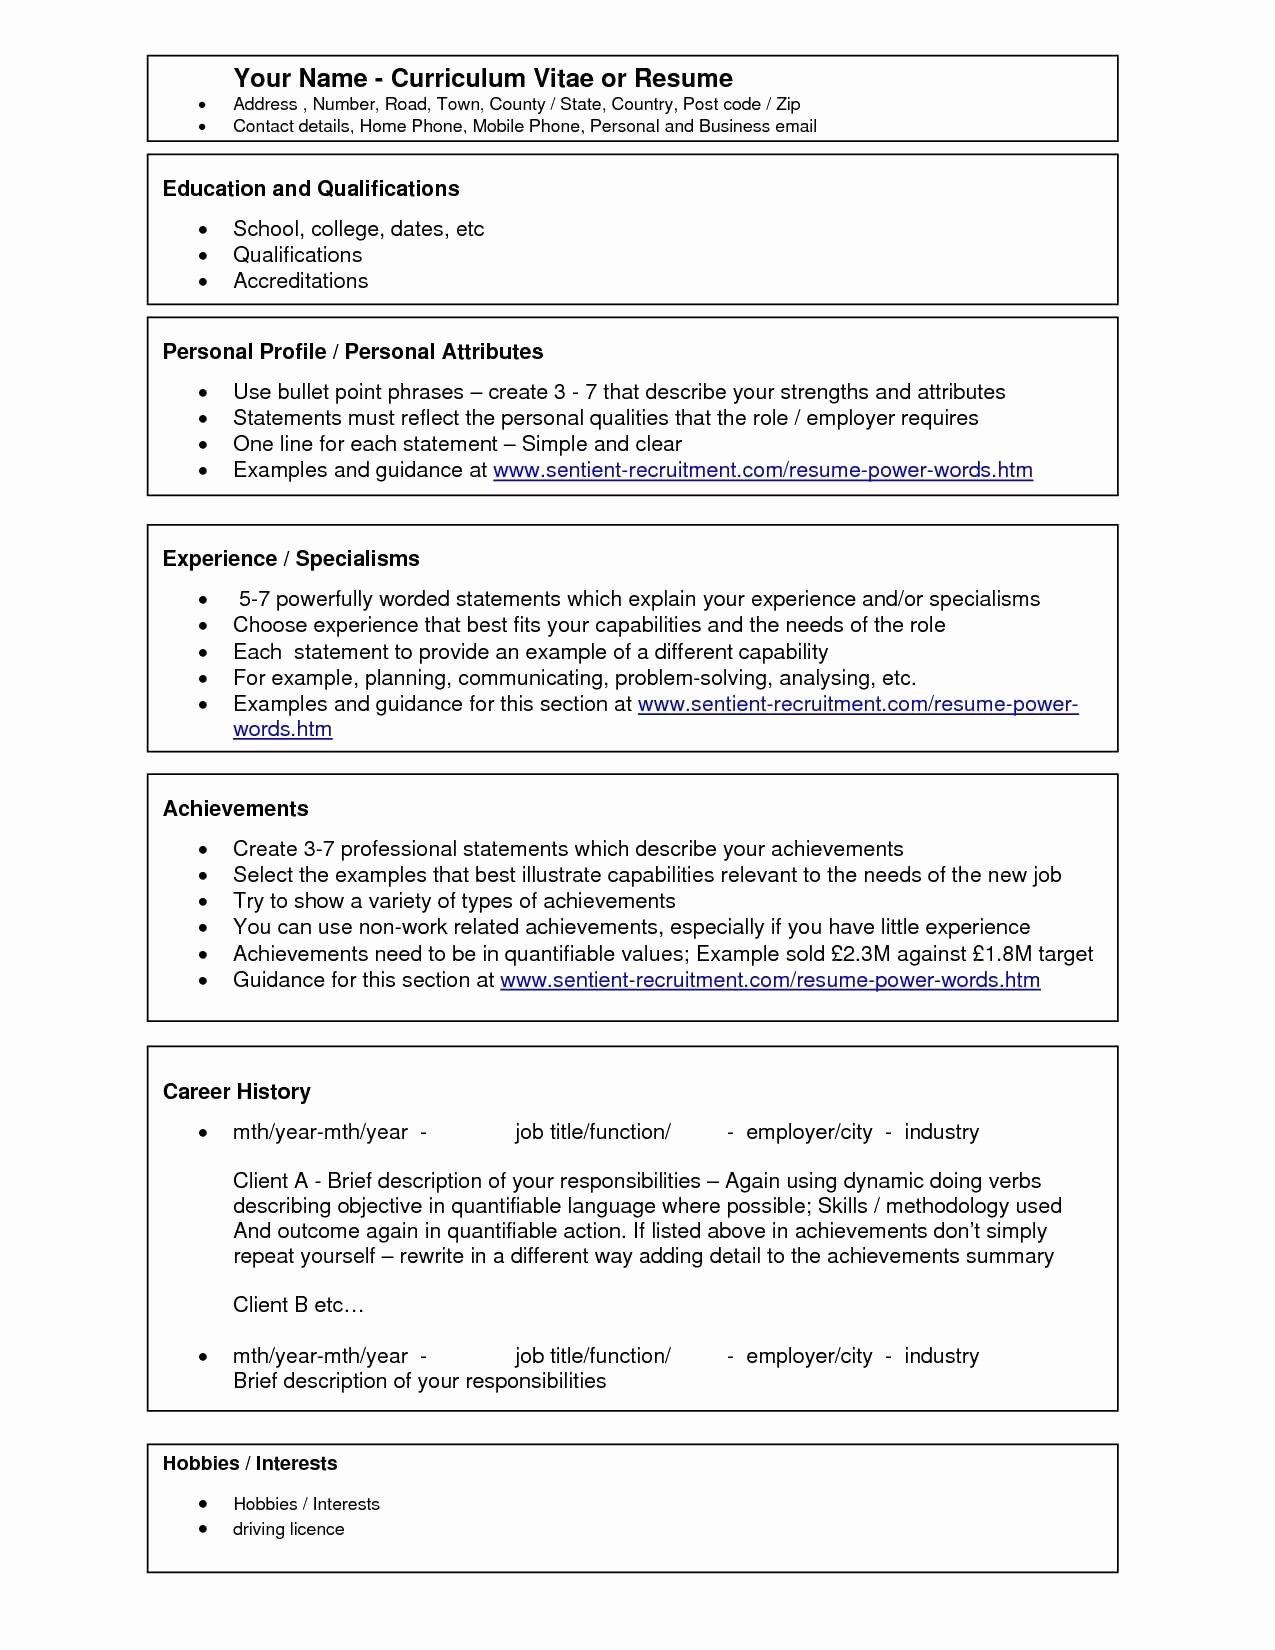 Microsoft Word Resume Builder Expert Microsoft Fice